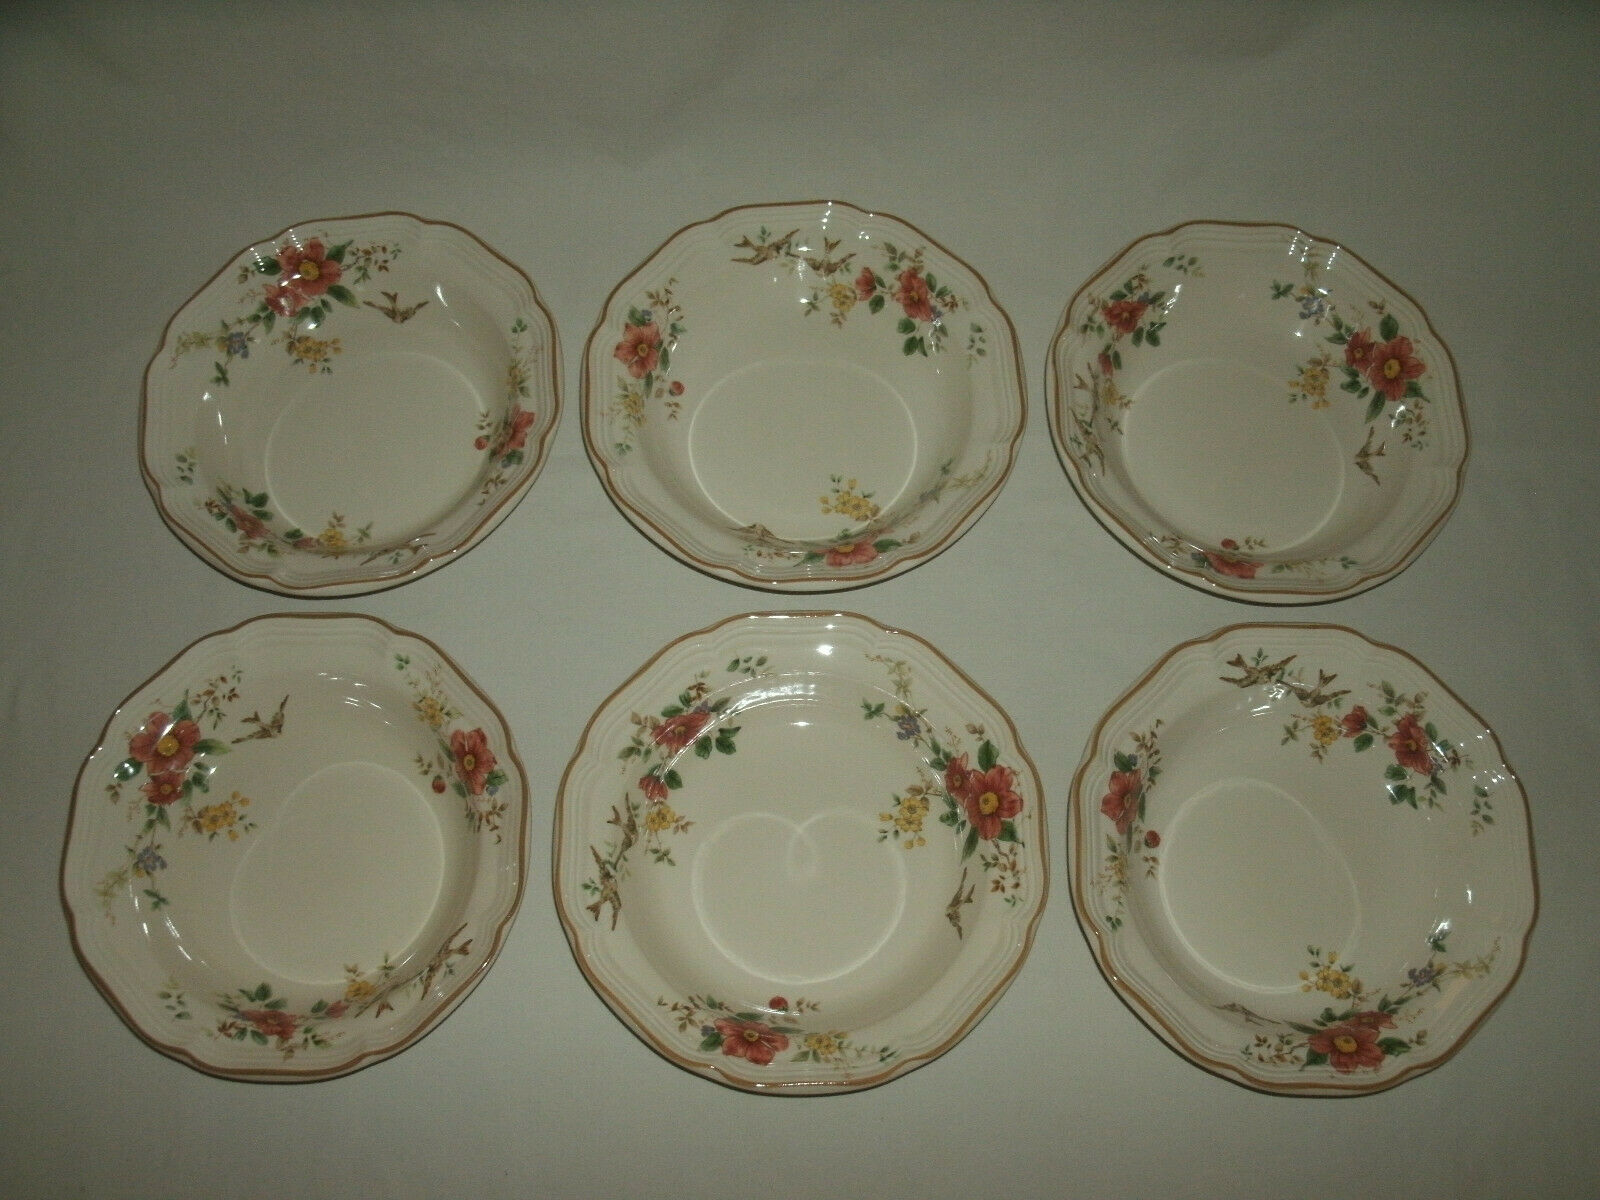 Set Of 6 Mikasa Heritage Capistrano China Soup Bowls Made In Japan 2 - $85.00